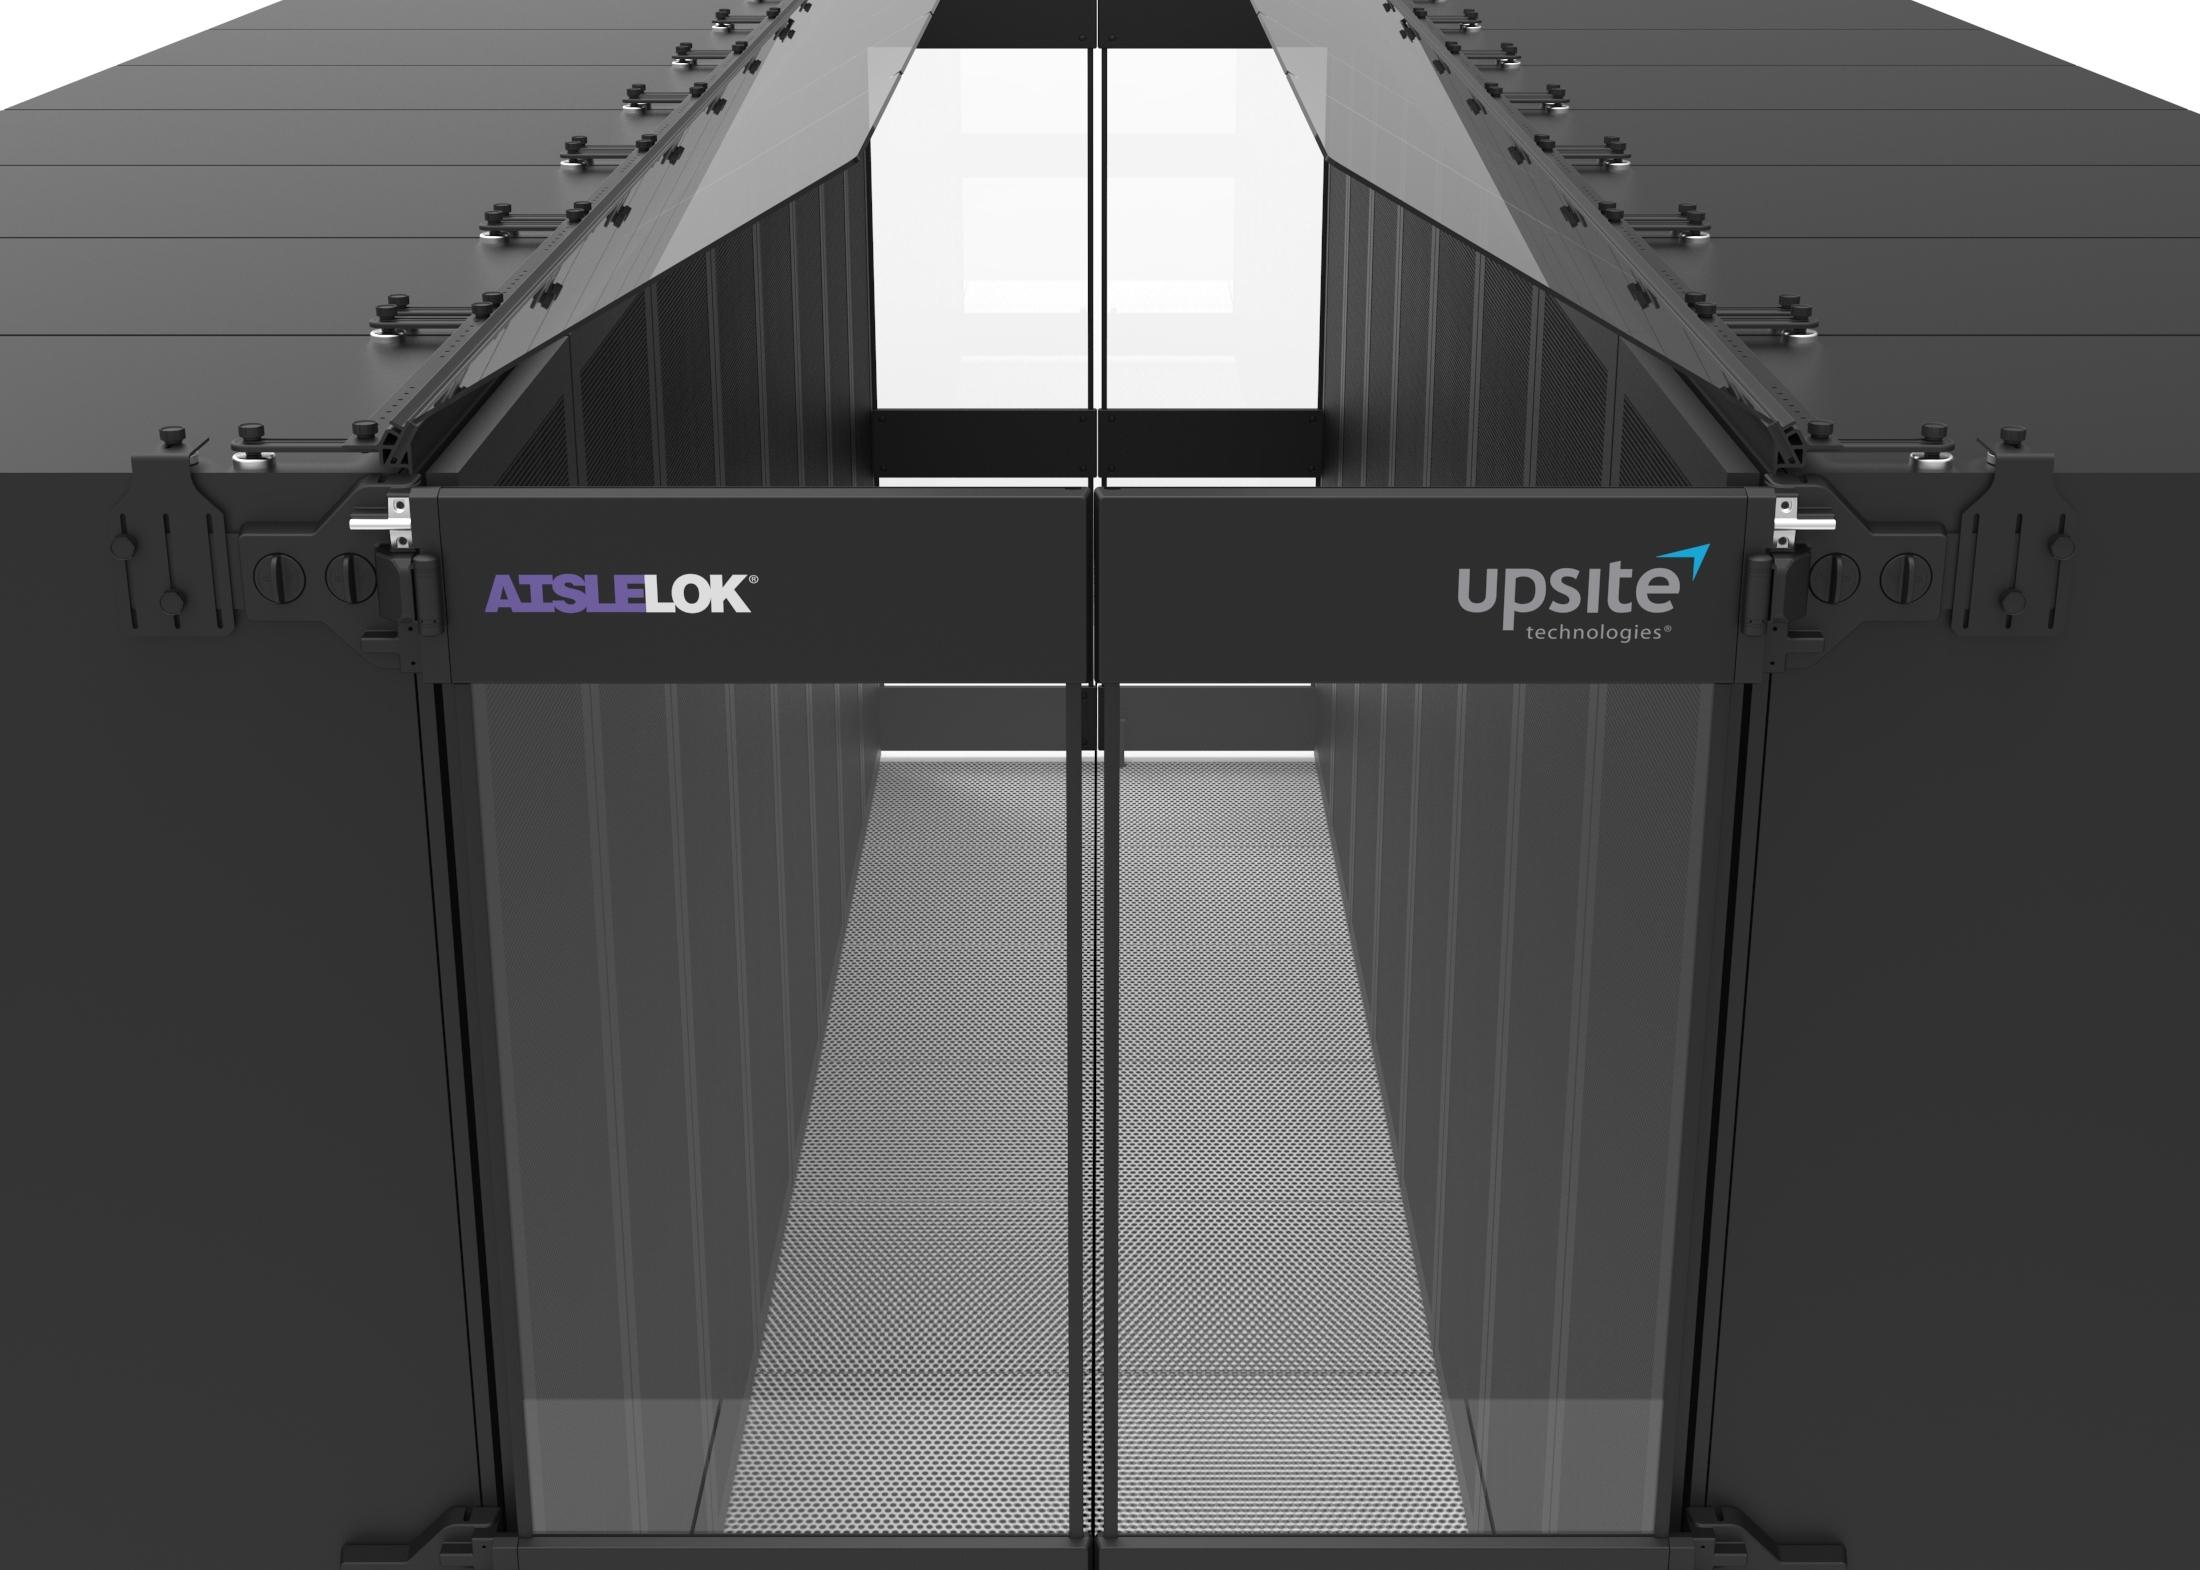 Upsite Technologies Releases New White Paper Comparing Modular Data